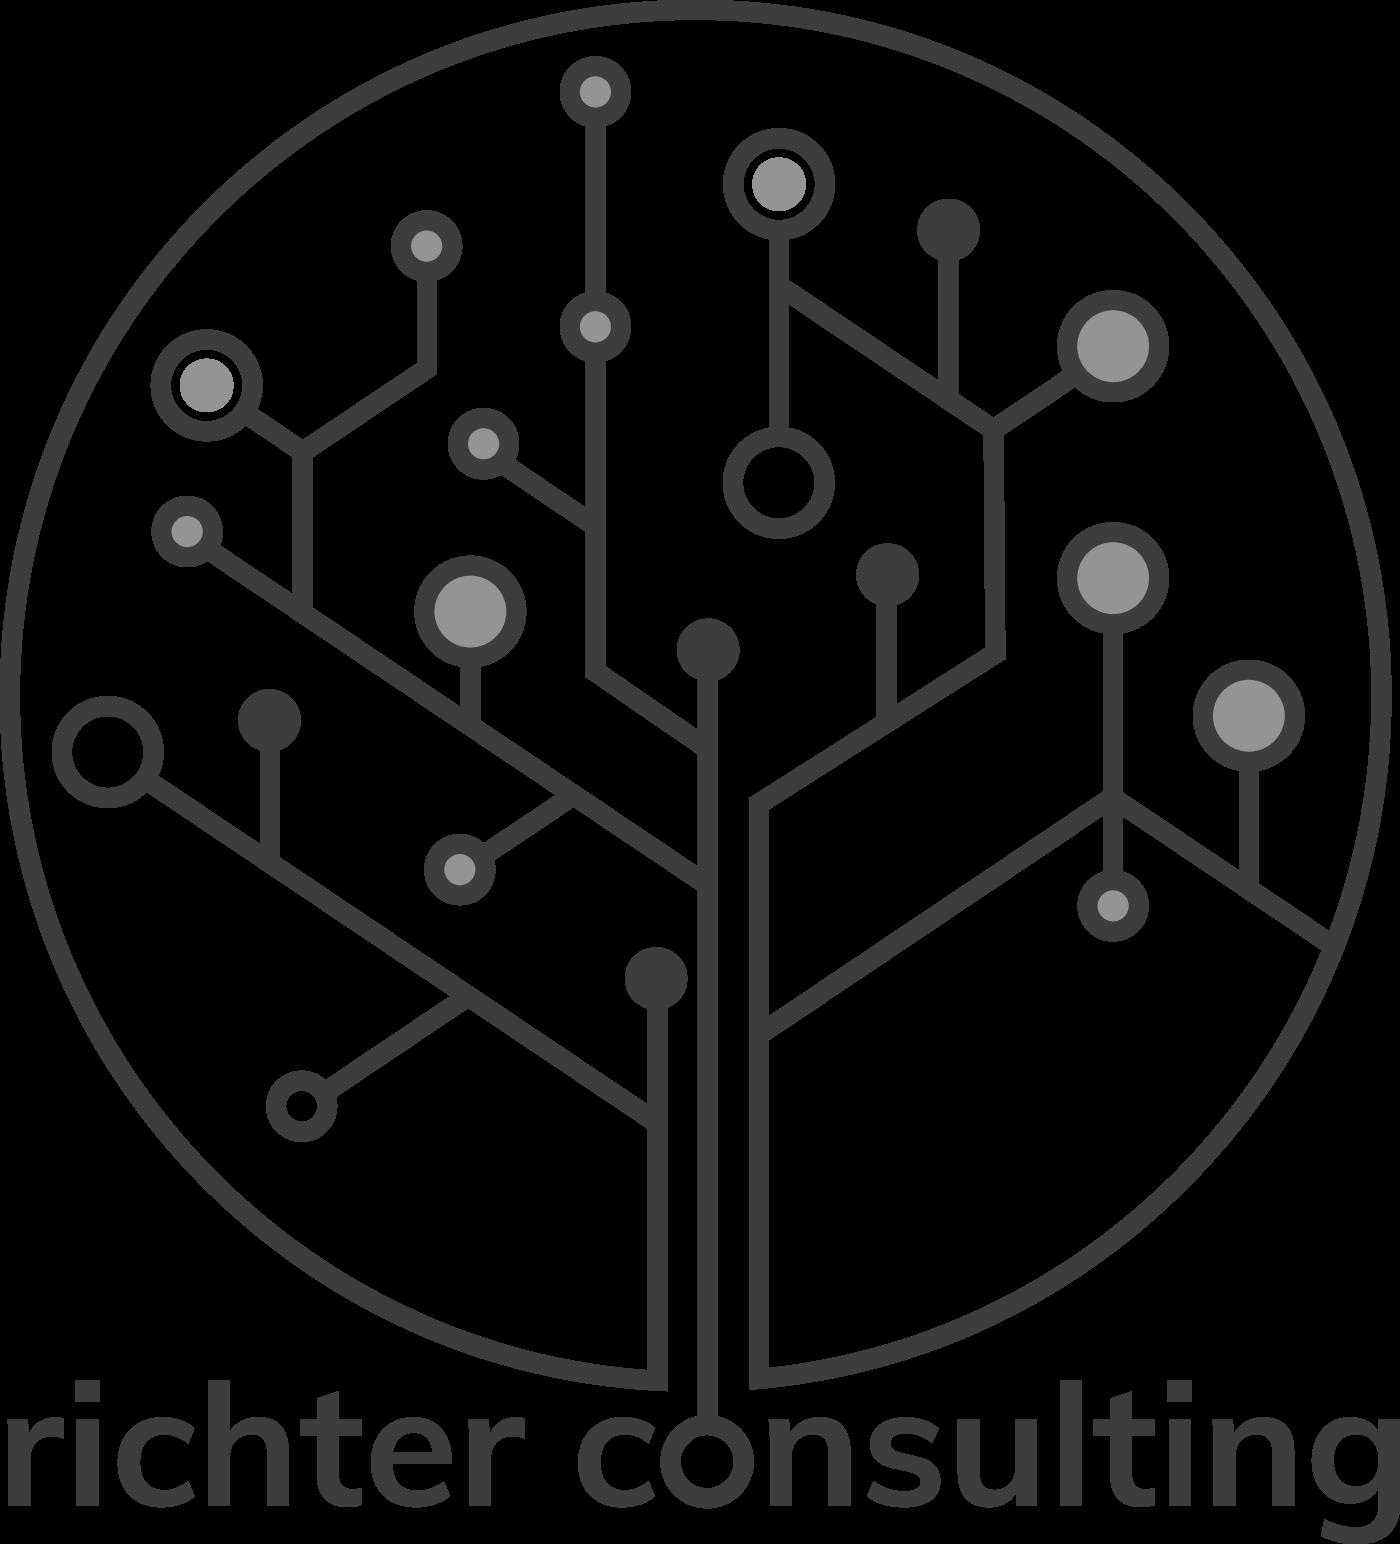 Logo richter consulting gmbh